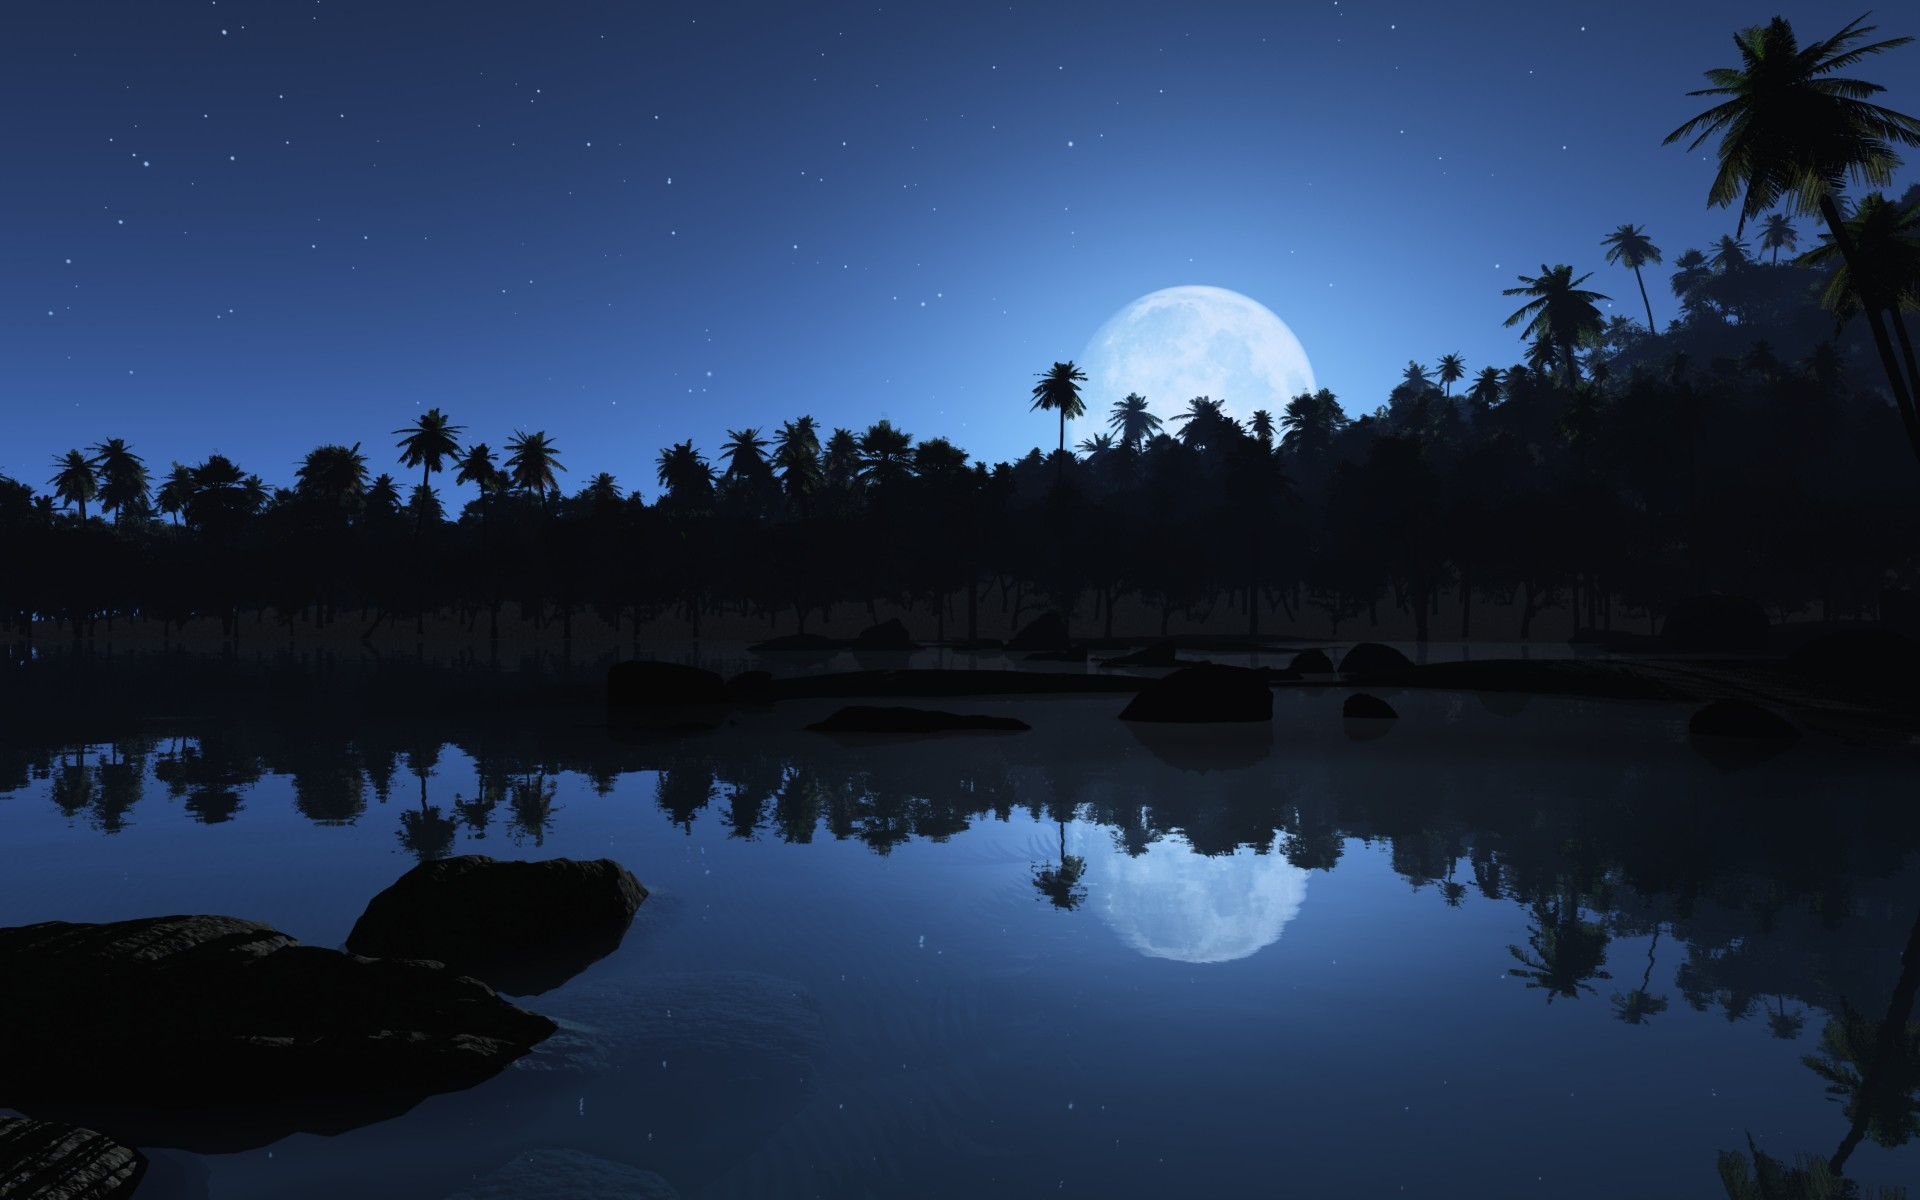 Full Moon Blue Night Wallpaper In Resolution Free Wallpapers .